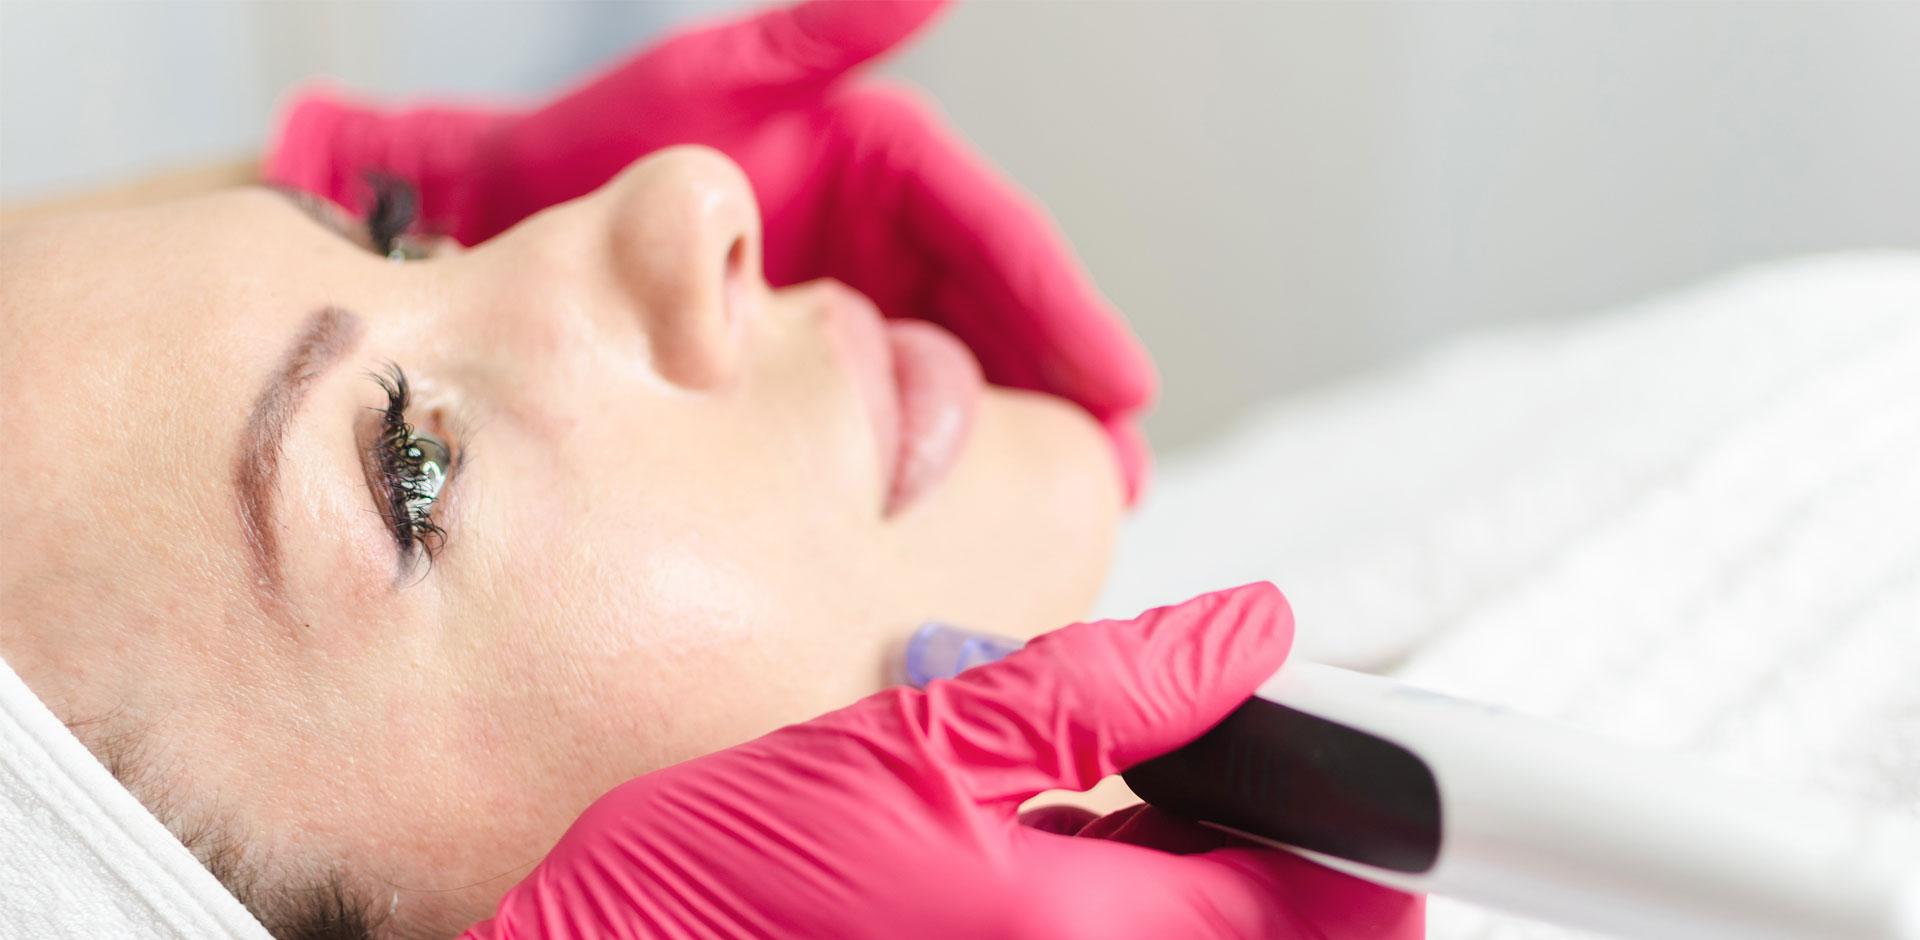 Microneedling Update: FDA Classifies Microneedling Devices